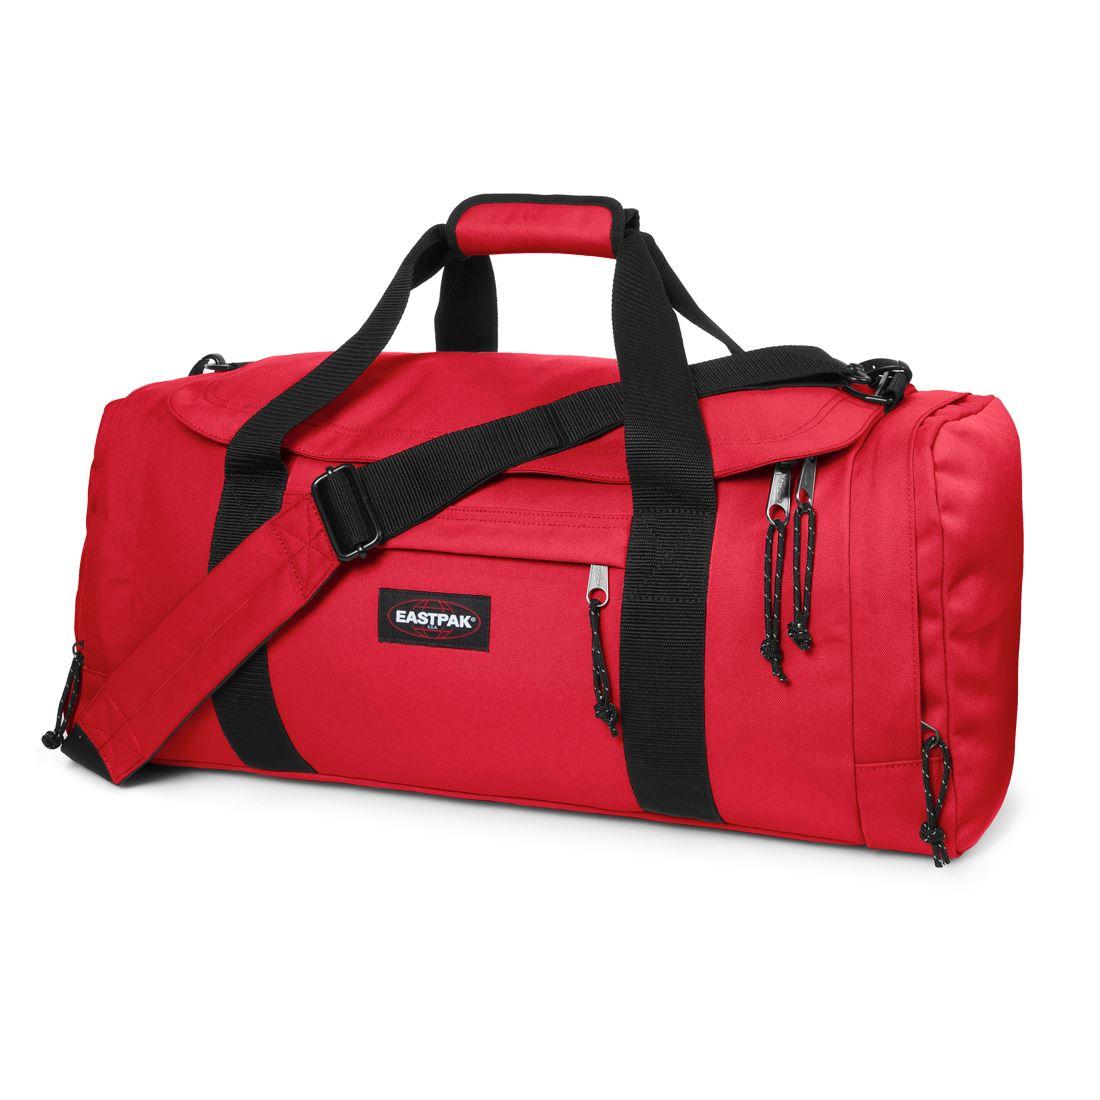 Eastpak Reader M Holdall Duffle Bag Ideal For